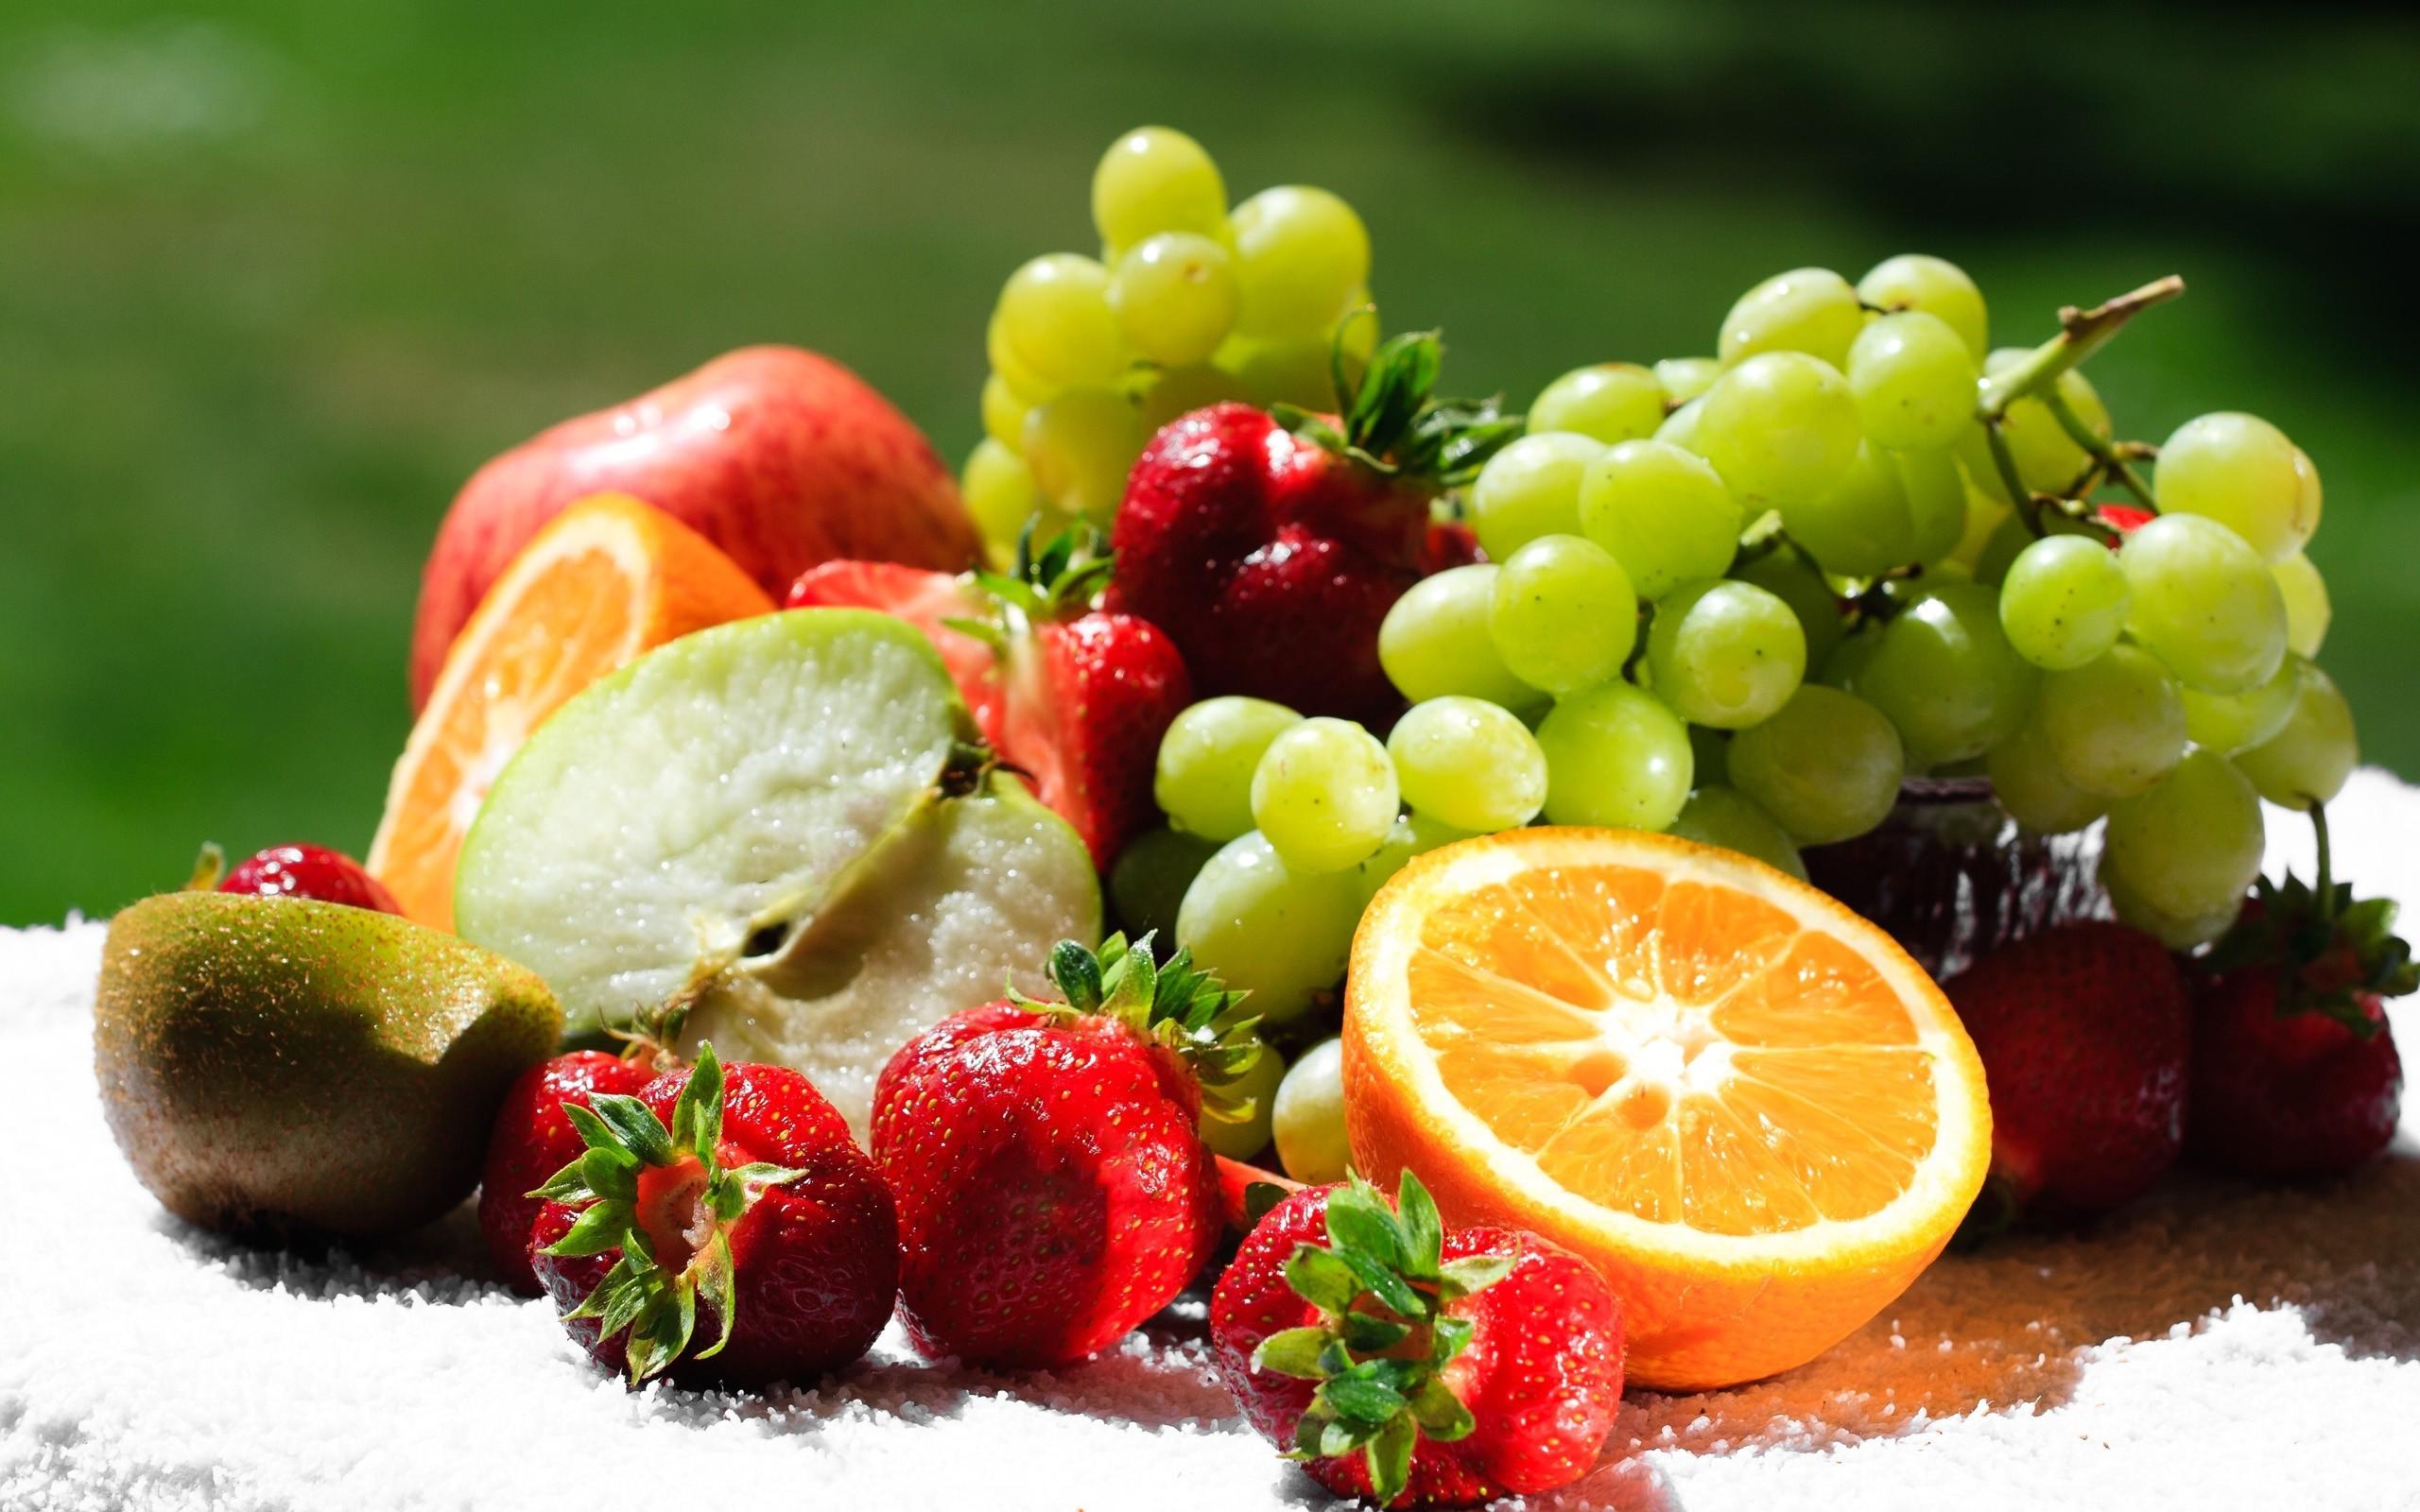 food fruit Wallpaper Backgrounds